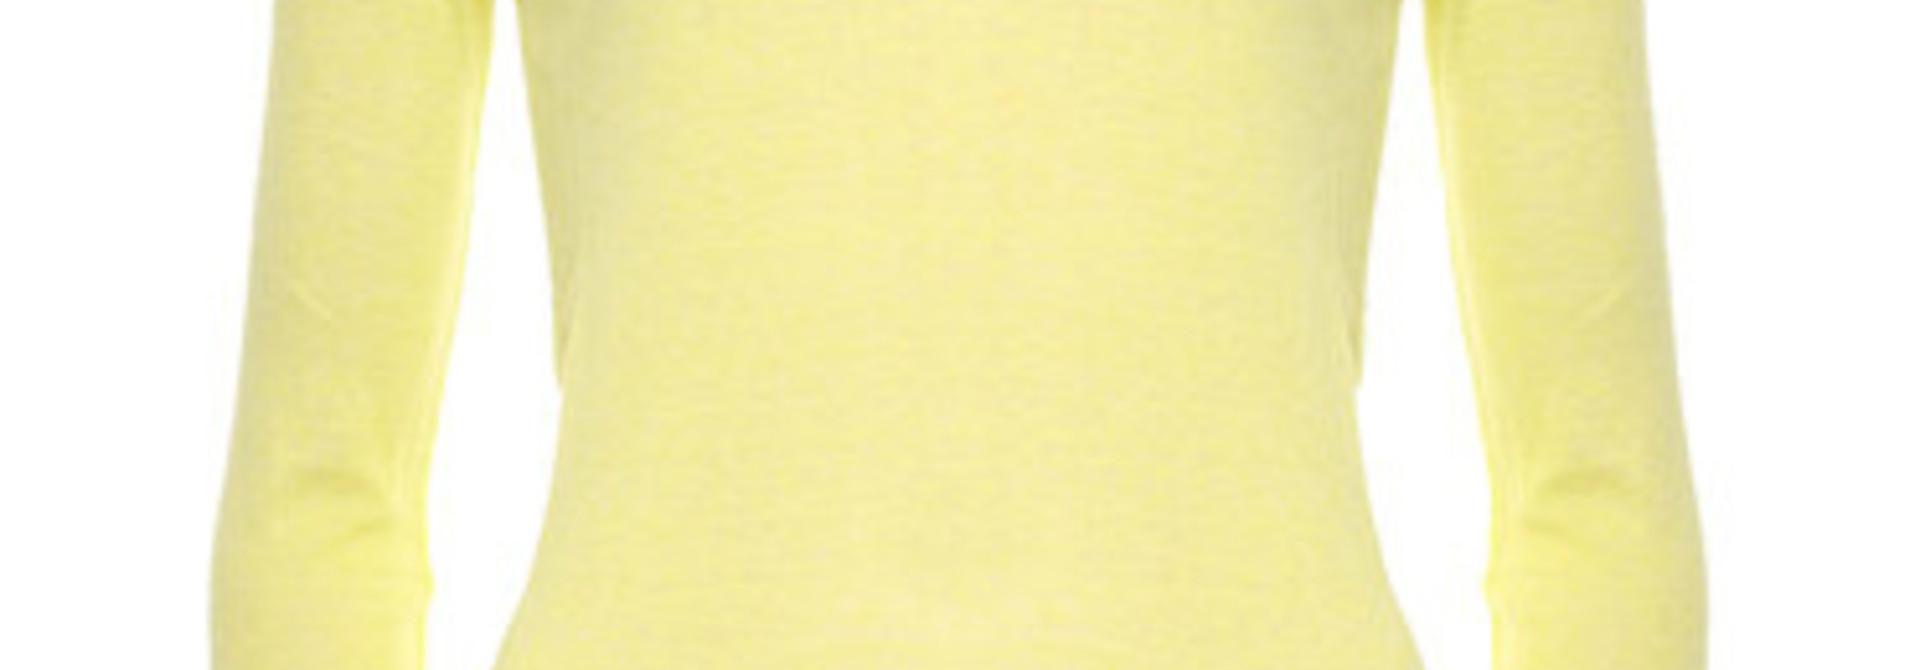 Top lemon peel